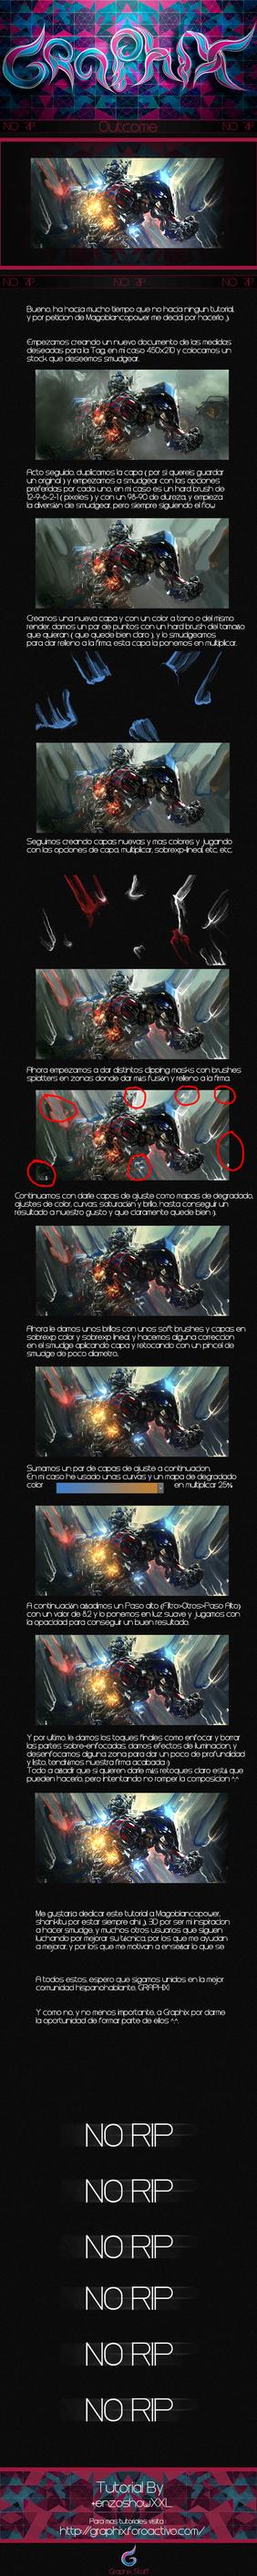 Optimus Prime Smudge tutorial by enzOSHOW